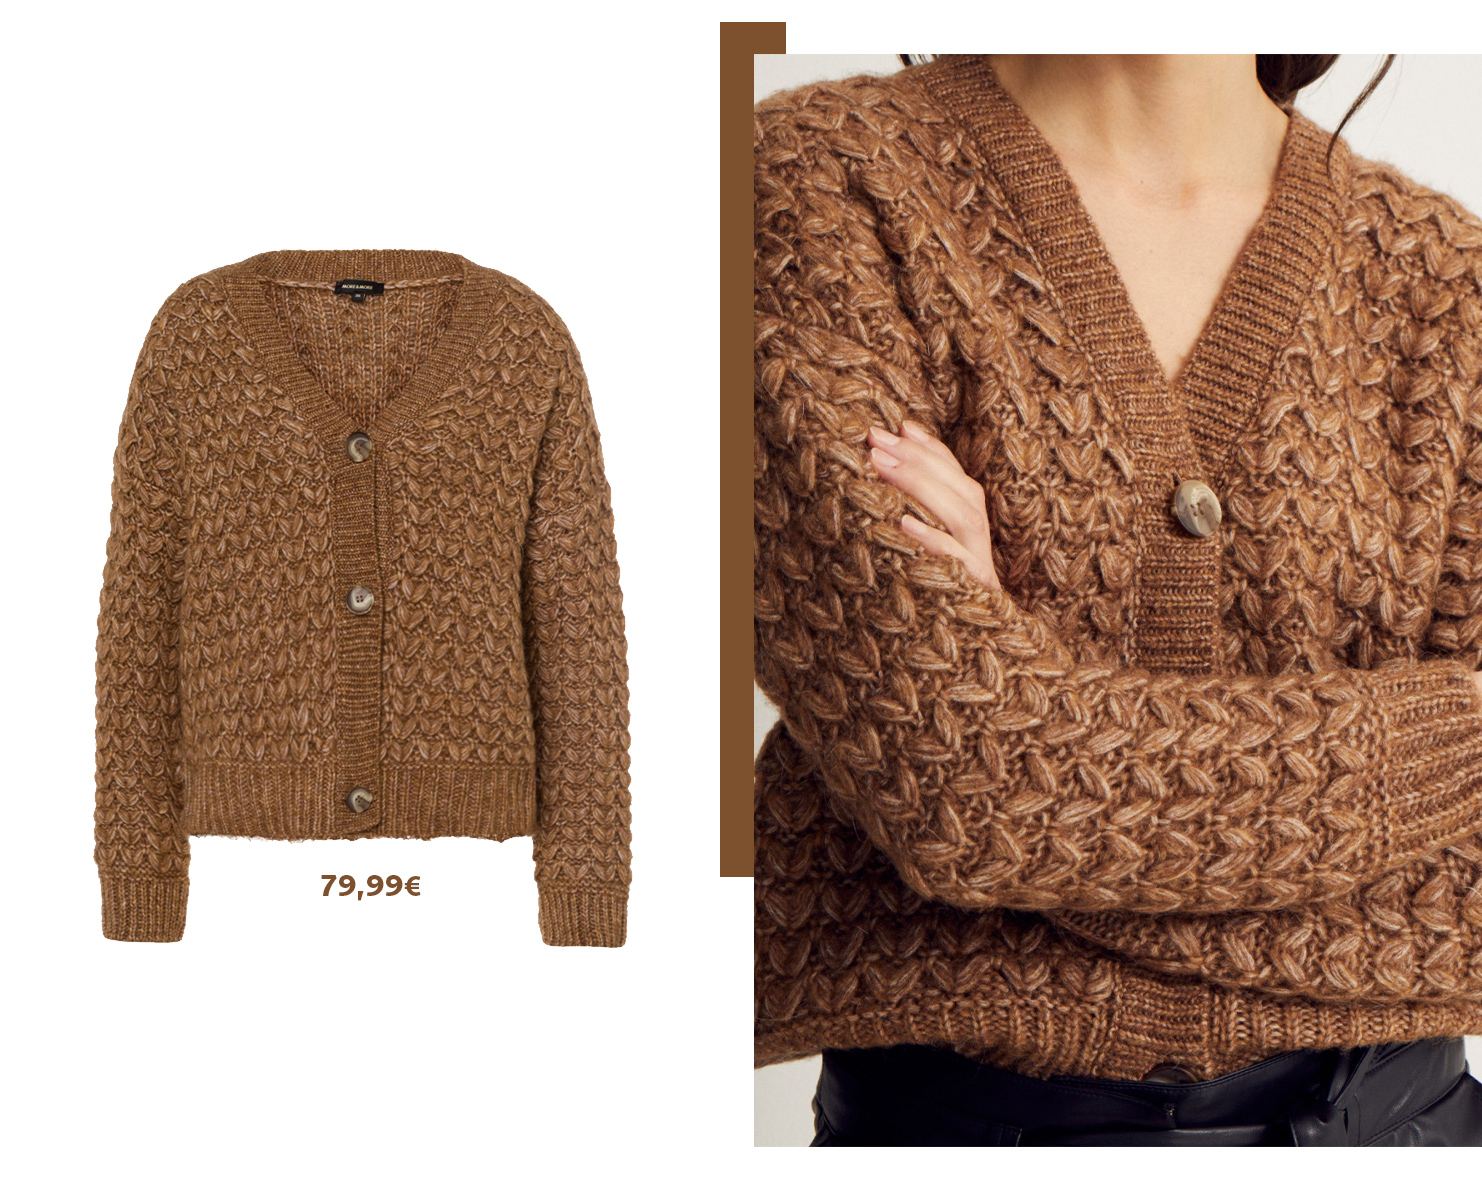 New Season, New Knit